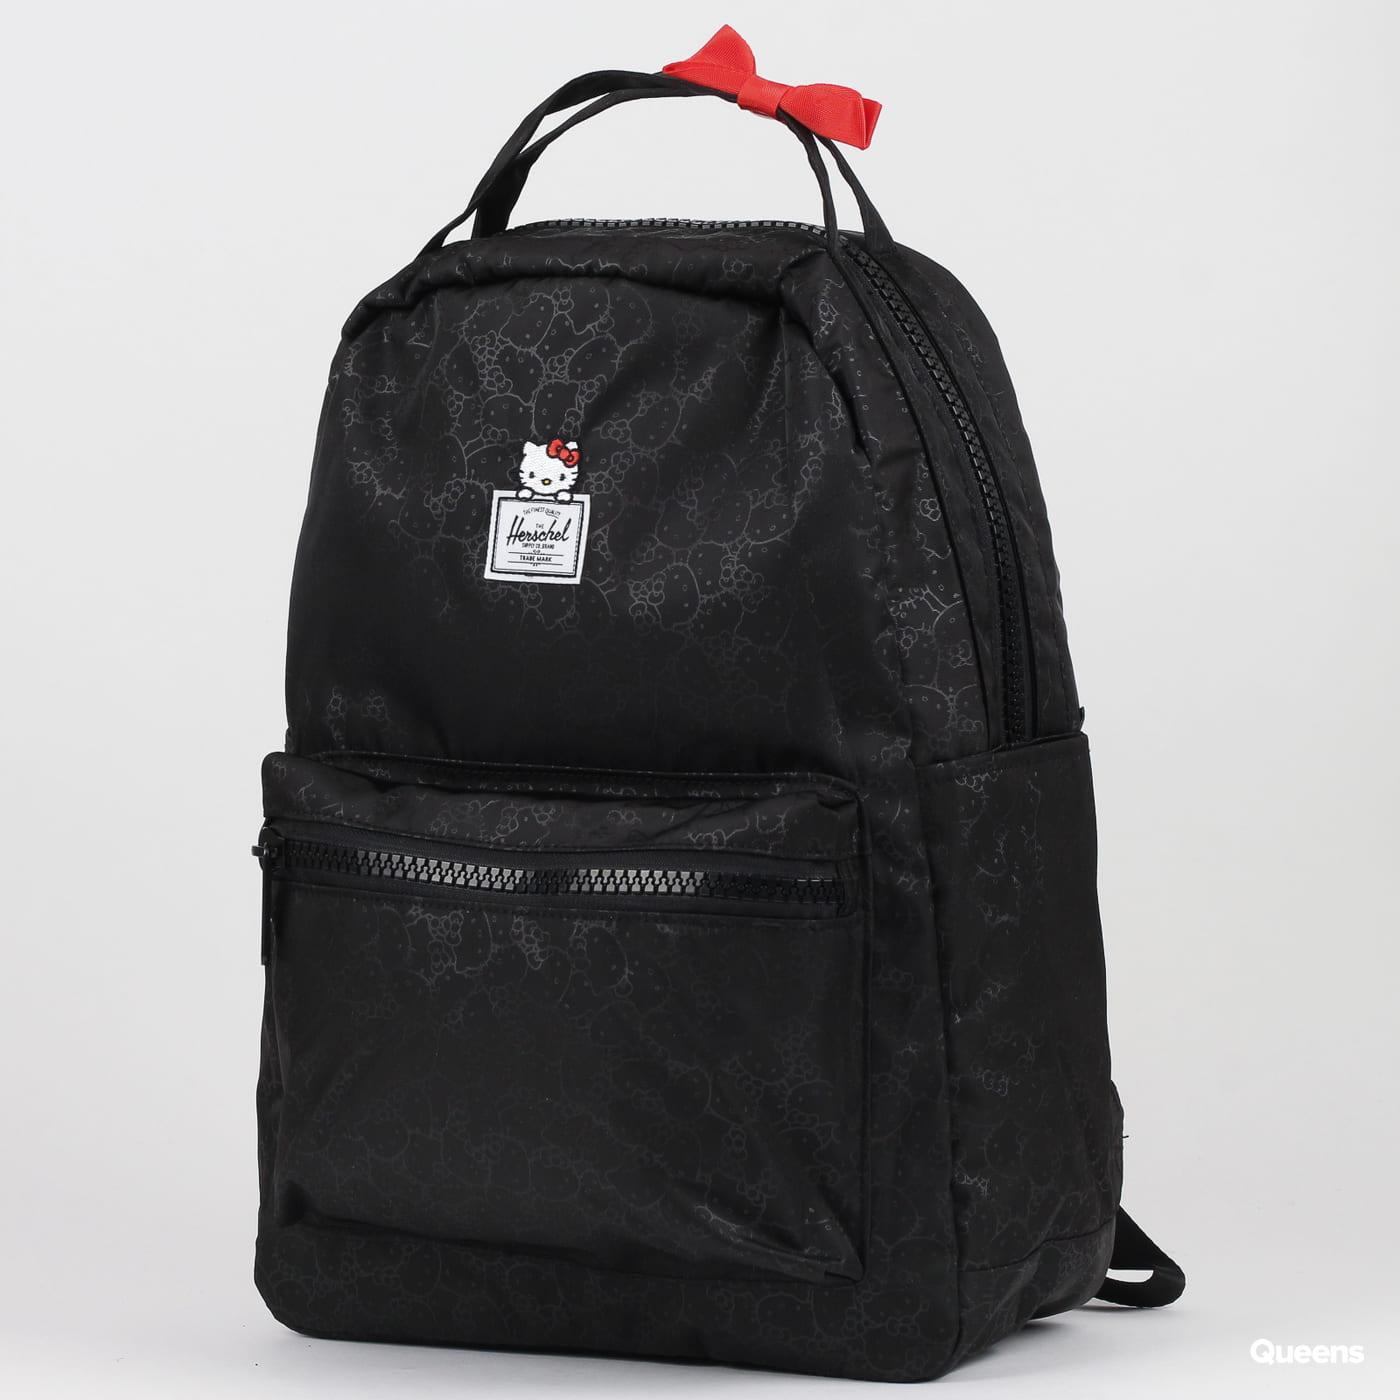 8da46b9dce3c Backpack The Herschel Supply CO. Nova Mid Hello Kitty Backpack  (10503-02557)– Queens 💚